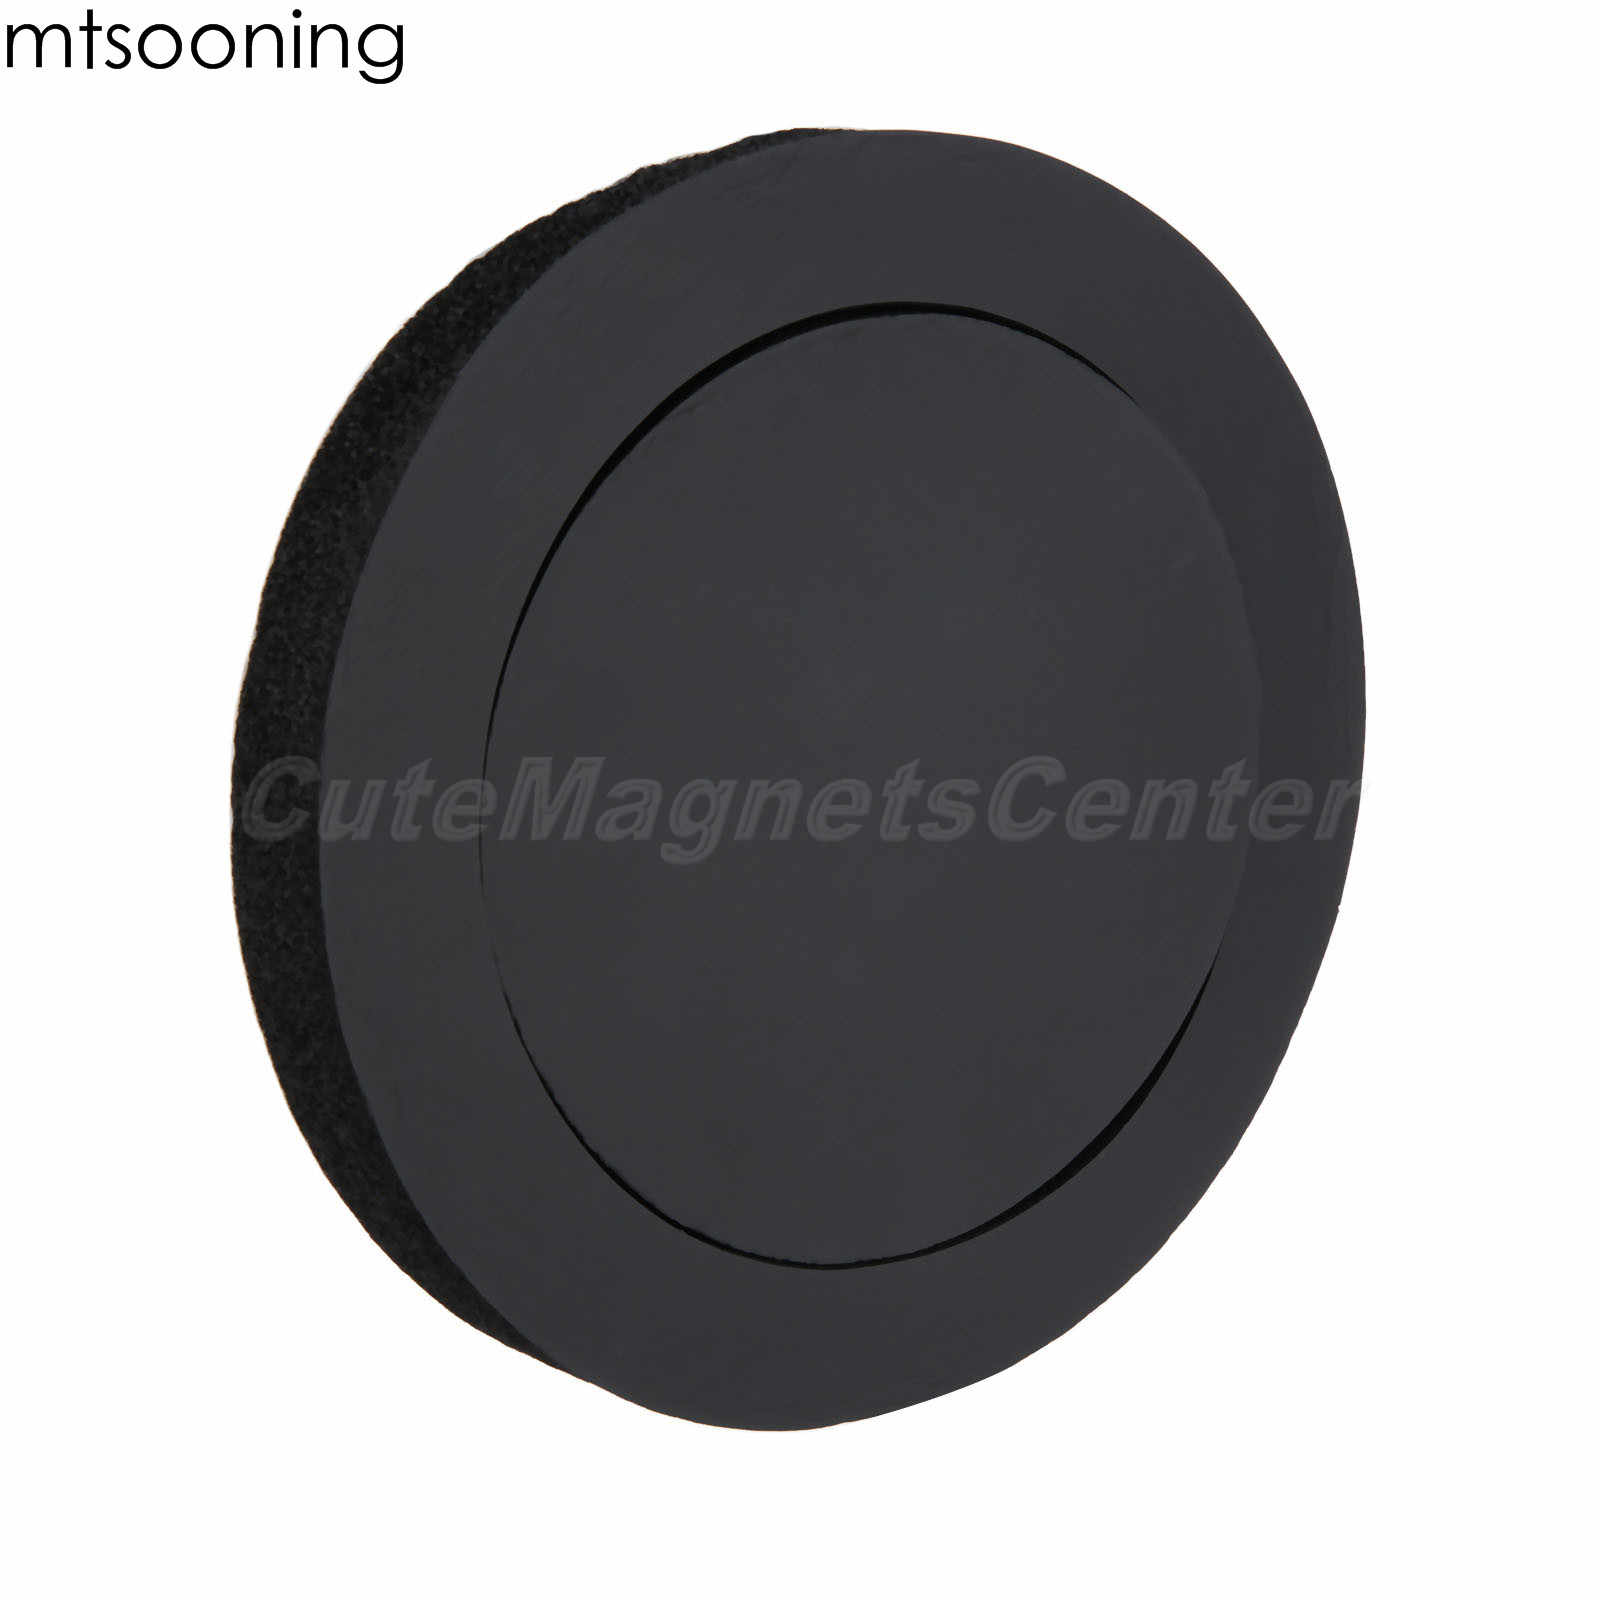 mtsooning 6.5 inch Black Car Speaker Insulation Ring Door Trim Sound Insulation Cotton Audio Speakers Adhesive Insulation Ring